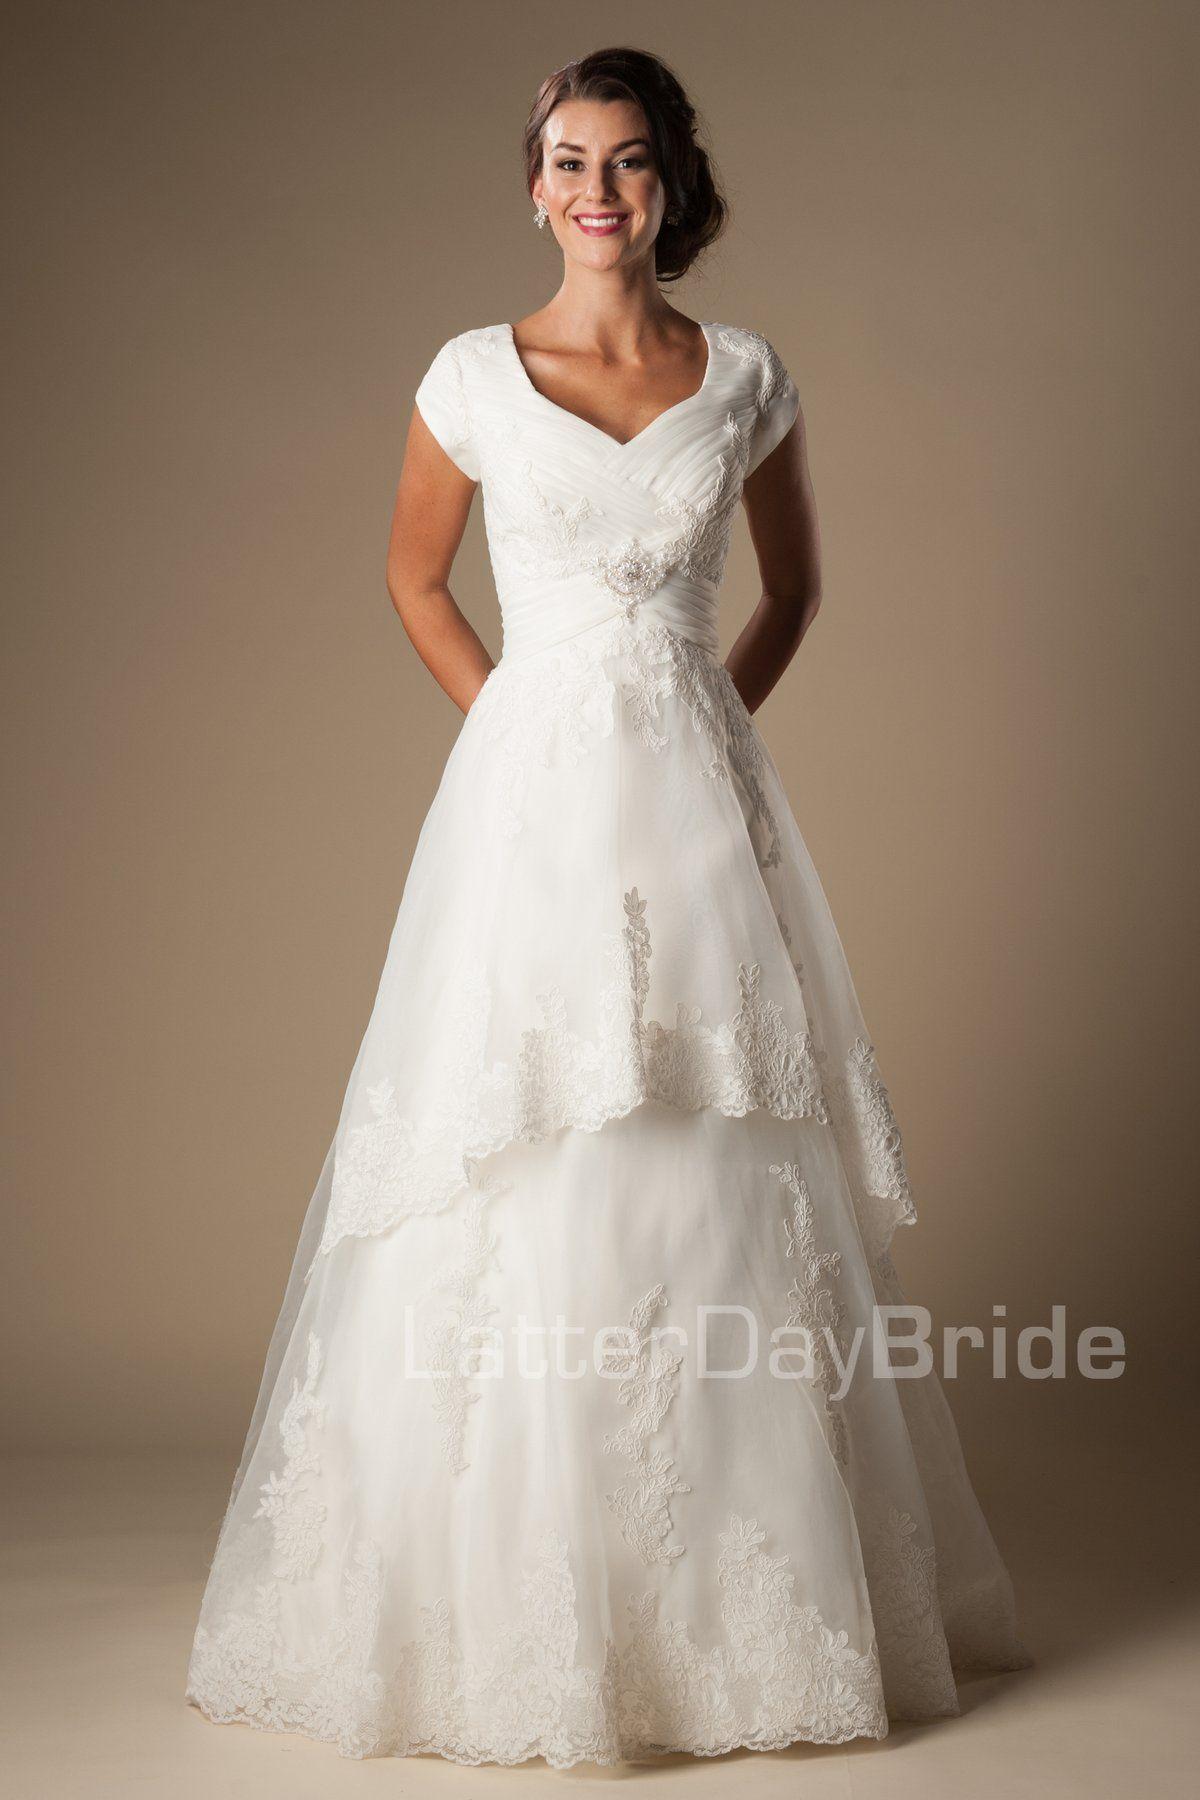 6489f82ff77 Constantine in 2019 | Wedding | Modest wedding dresses, Wedding ...